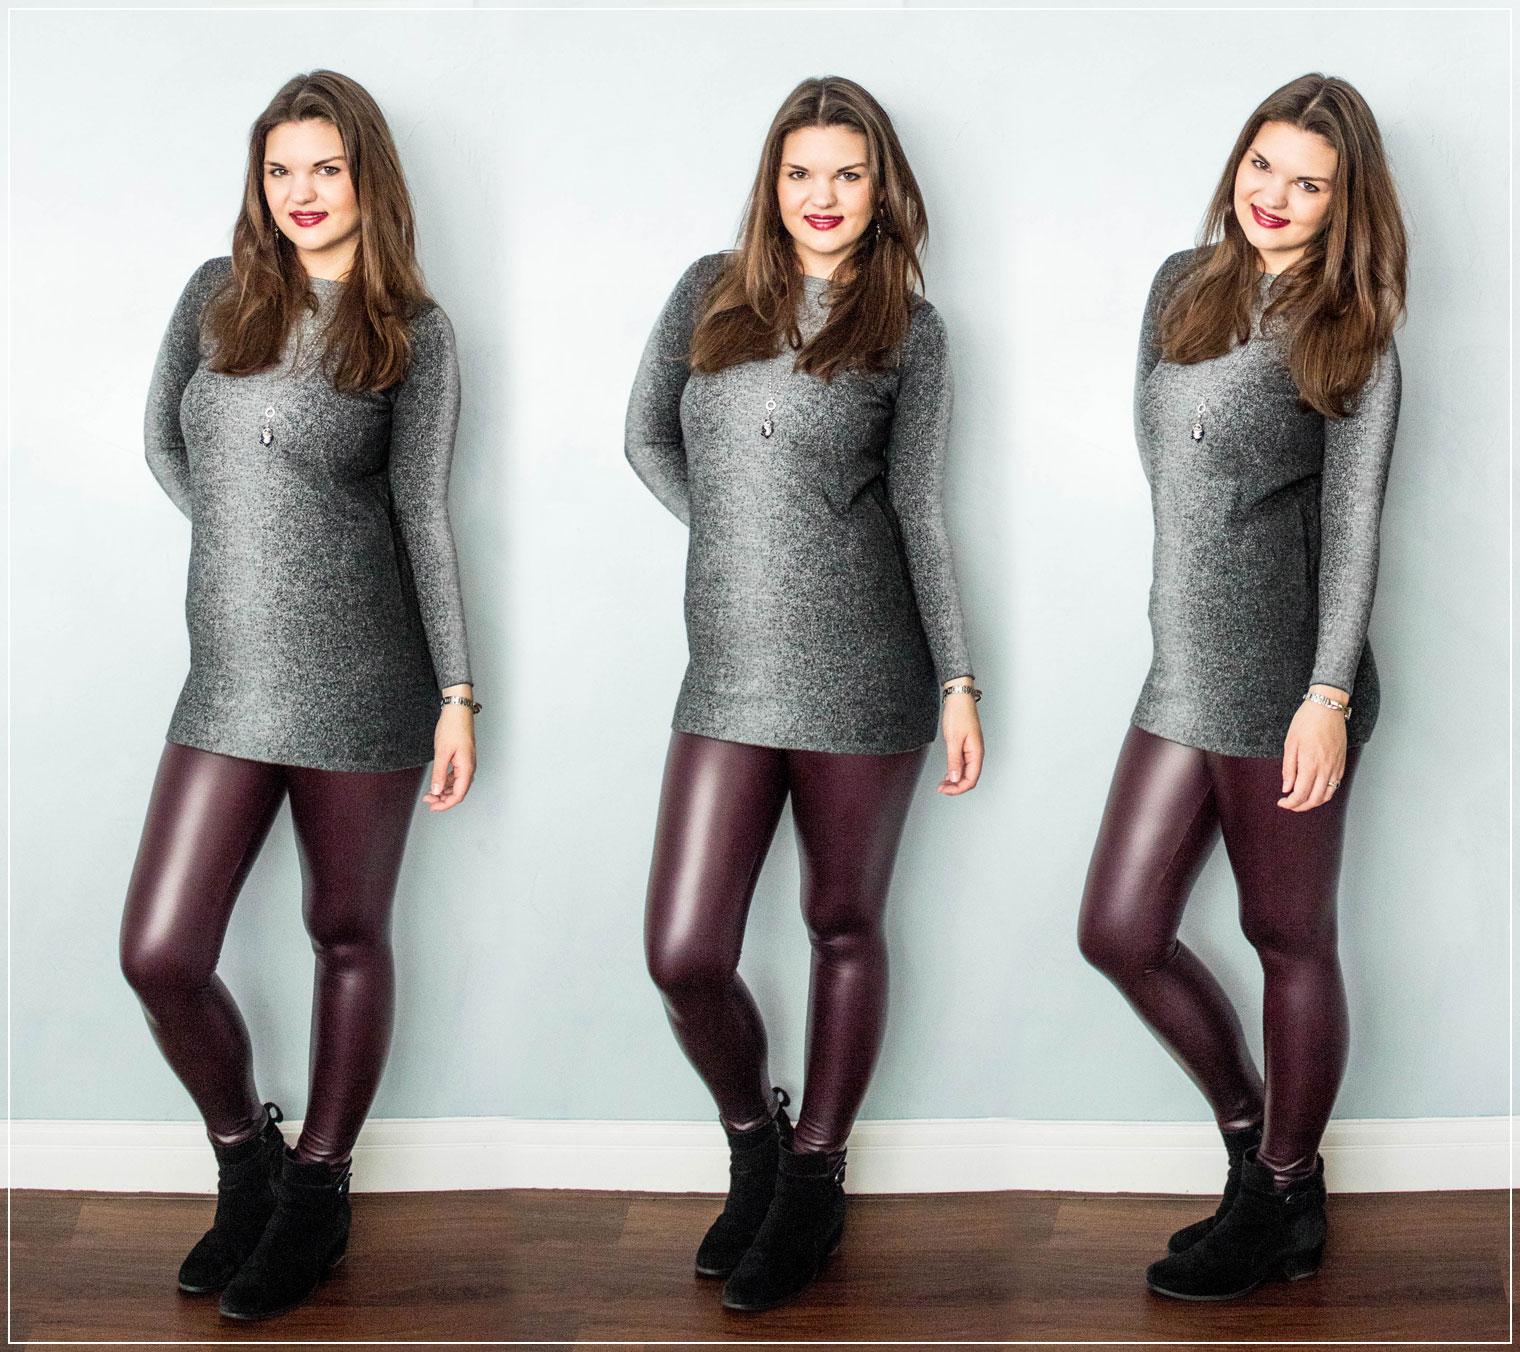 Dailylooks, Herbststyle, Herbstlooks, Herbstoutfits, Herbstmode, Fashionblog, Modebloggerin, Ruhrgebiet, Monatsreview, Modeblog